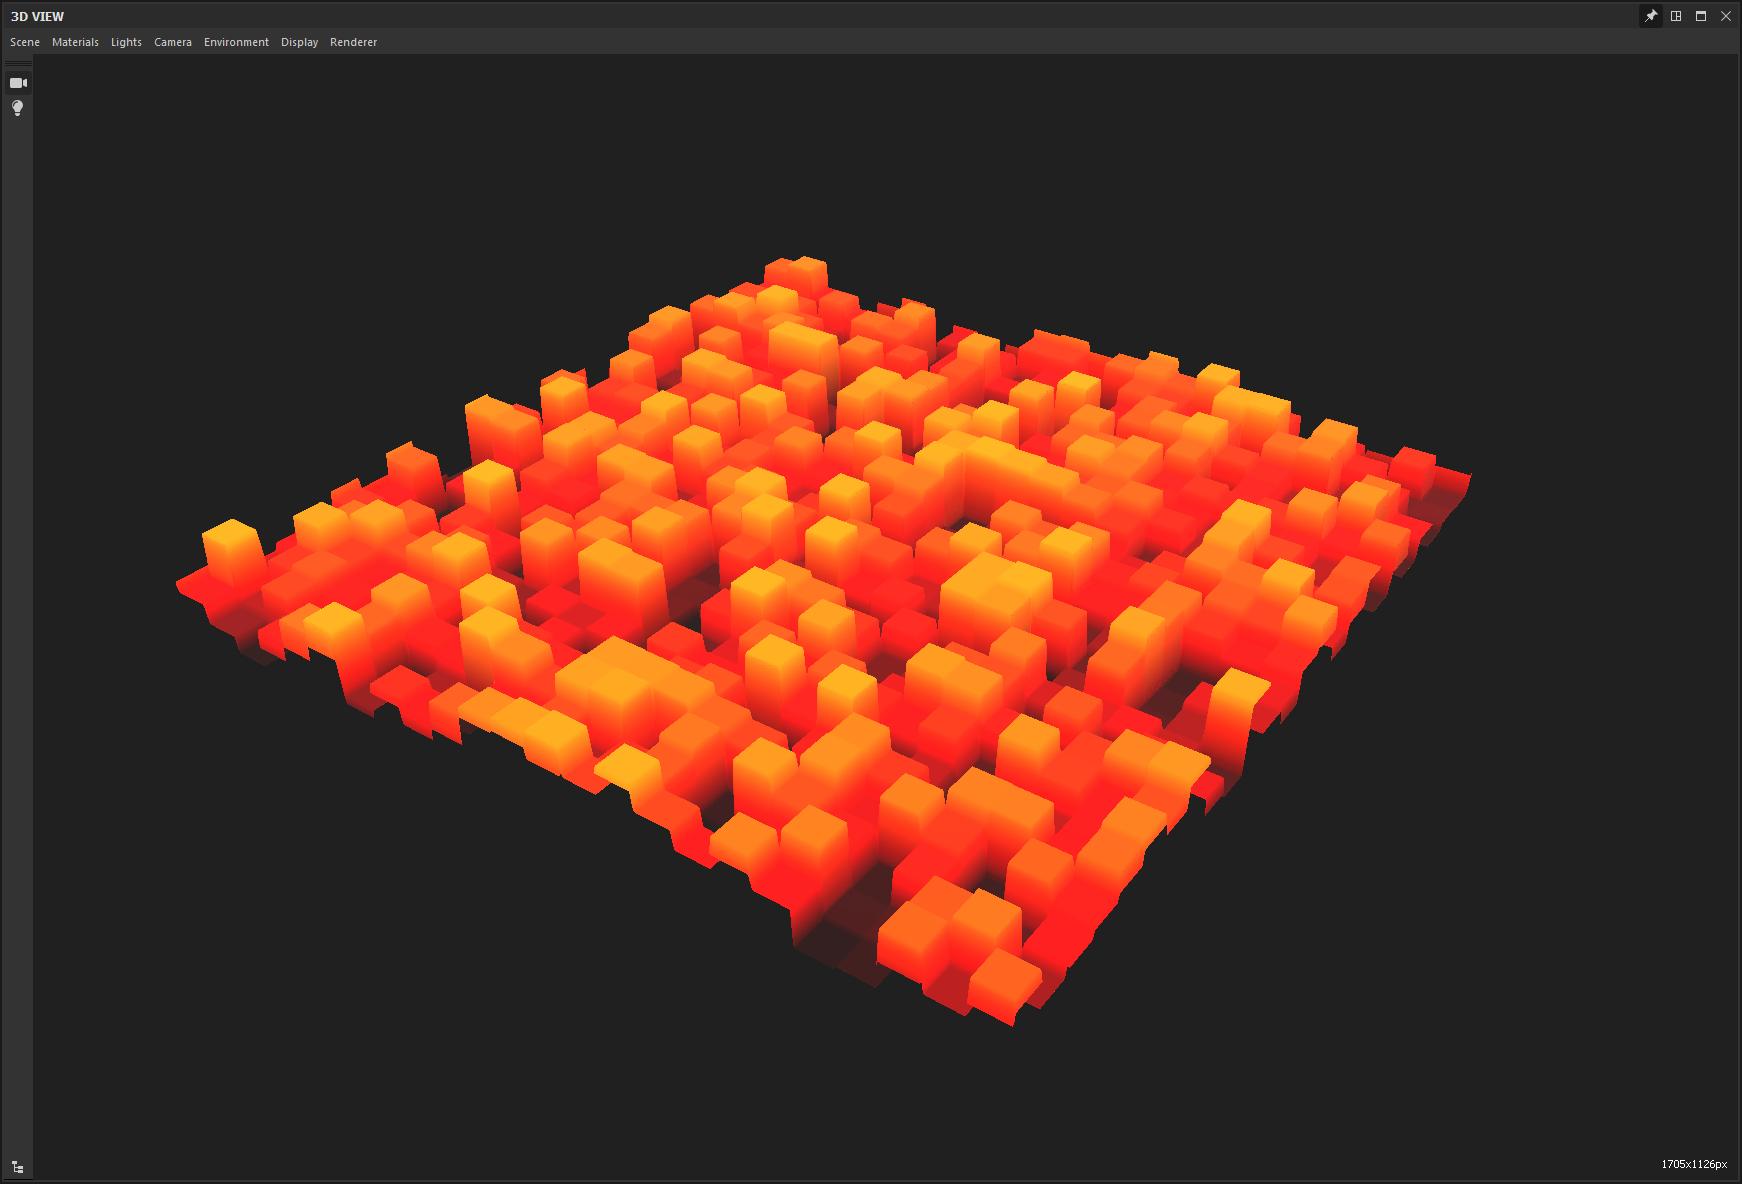 orange_blocks.jpg